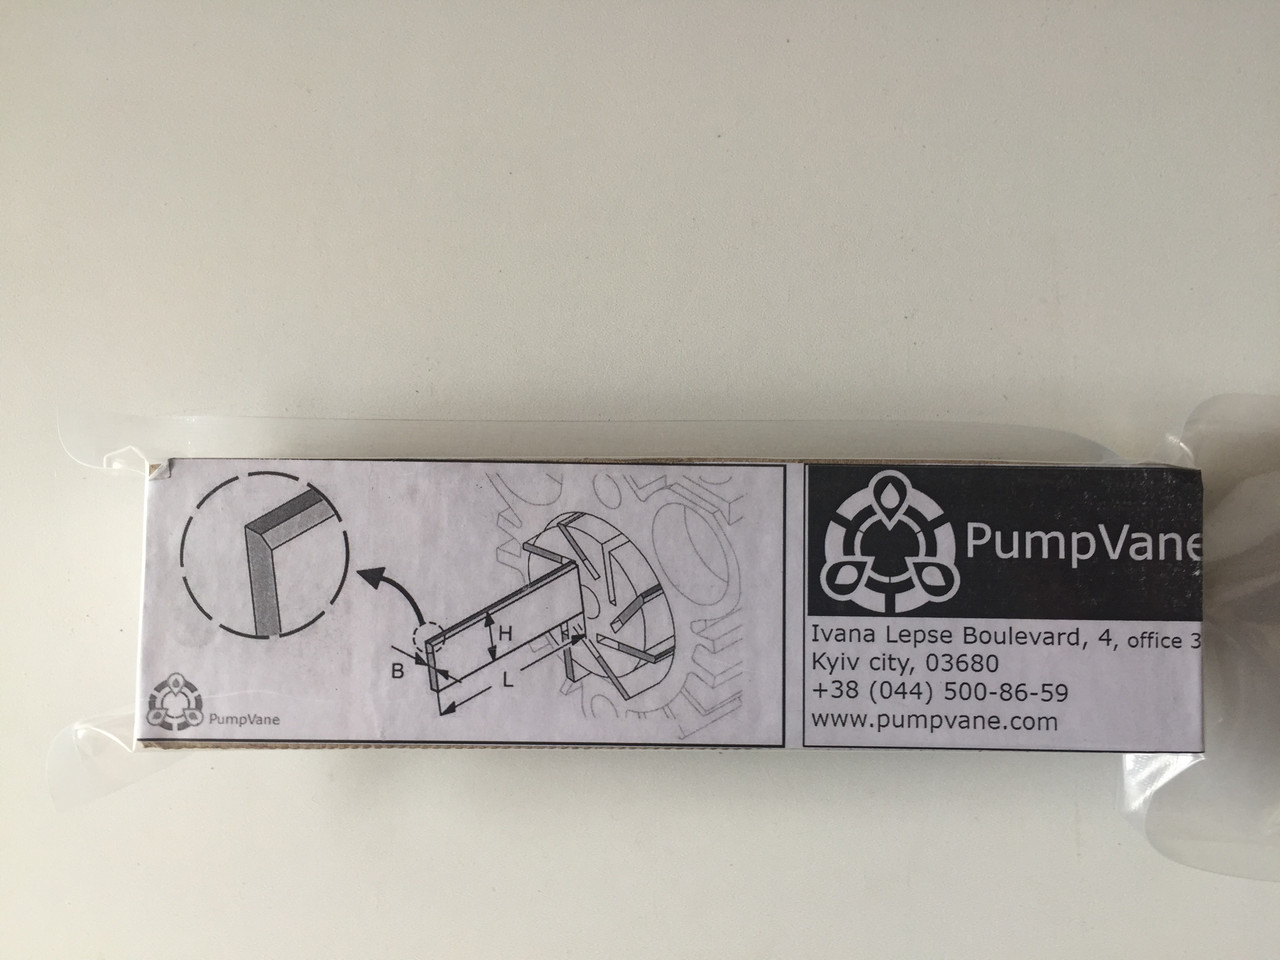 98 х 36.5 х 4 мм Лопатка графитовая для вакуумного насоса Busch SD 1025 B 722521014